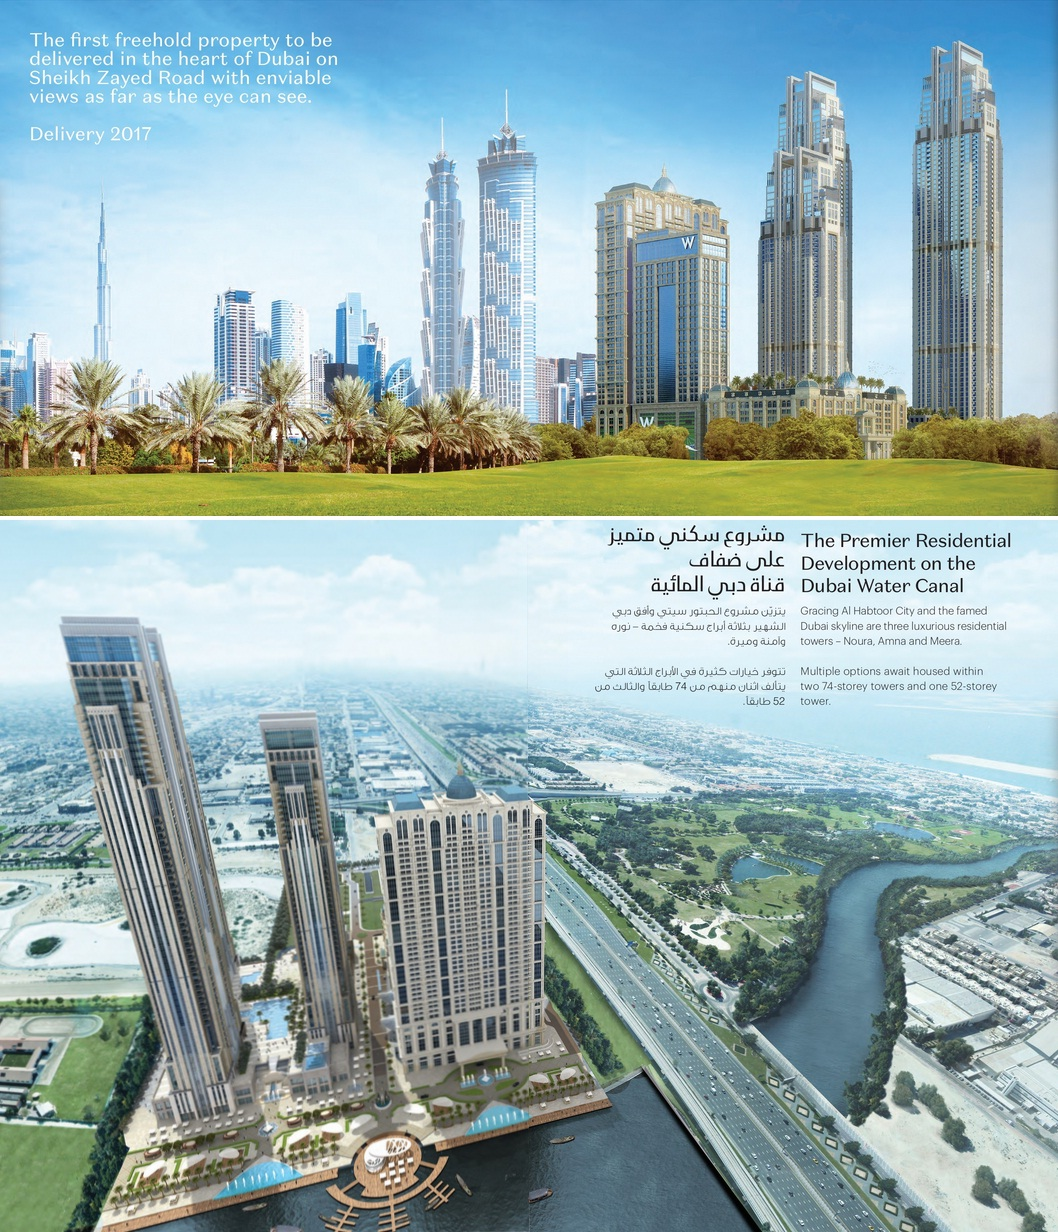 Noura Tower Al Habtoor City Dubai